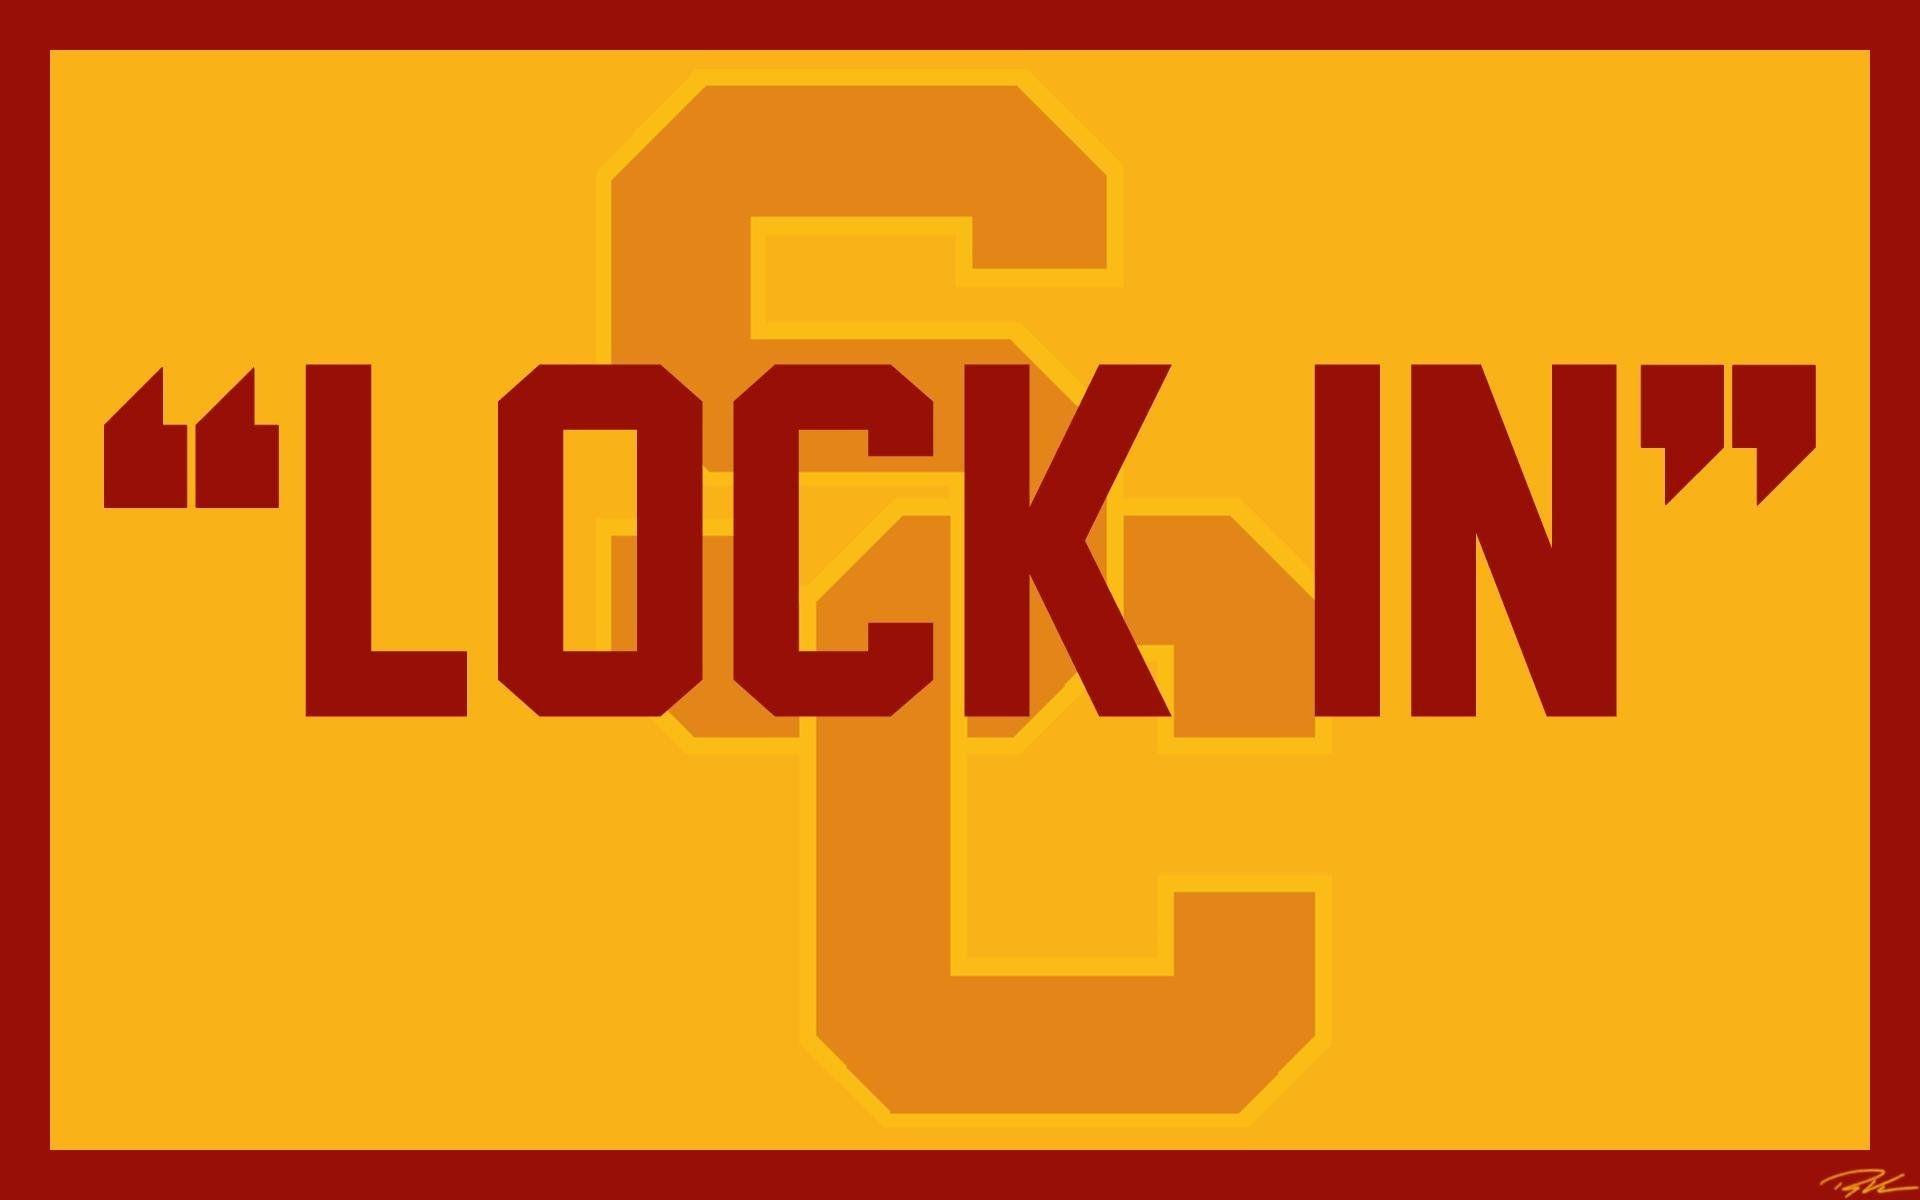 Res: 1920x1200, USC TROJANS college football wallpaper | 1500x1500 | 592768 .